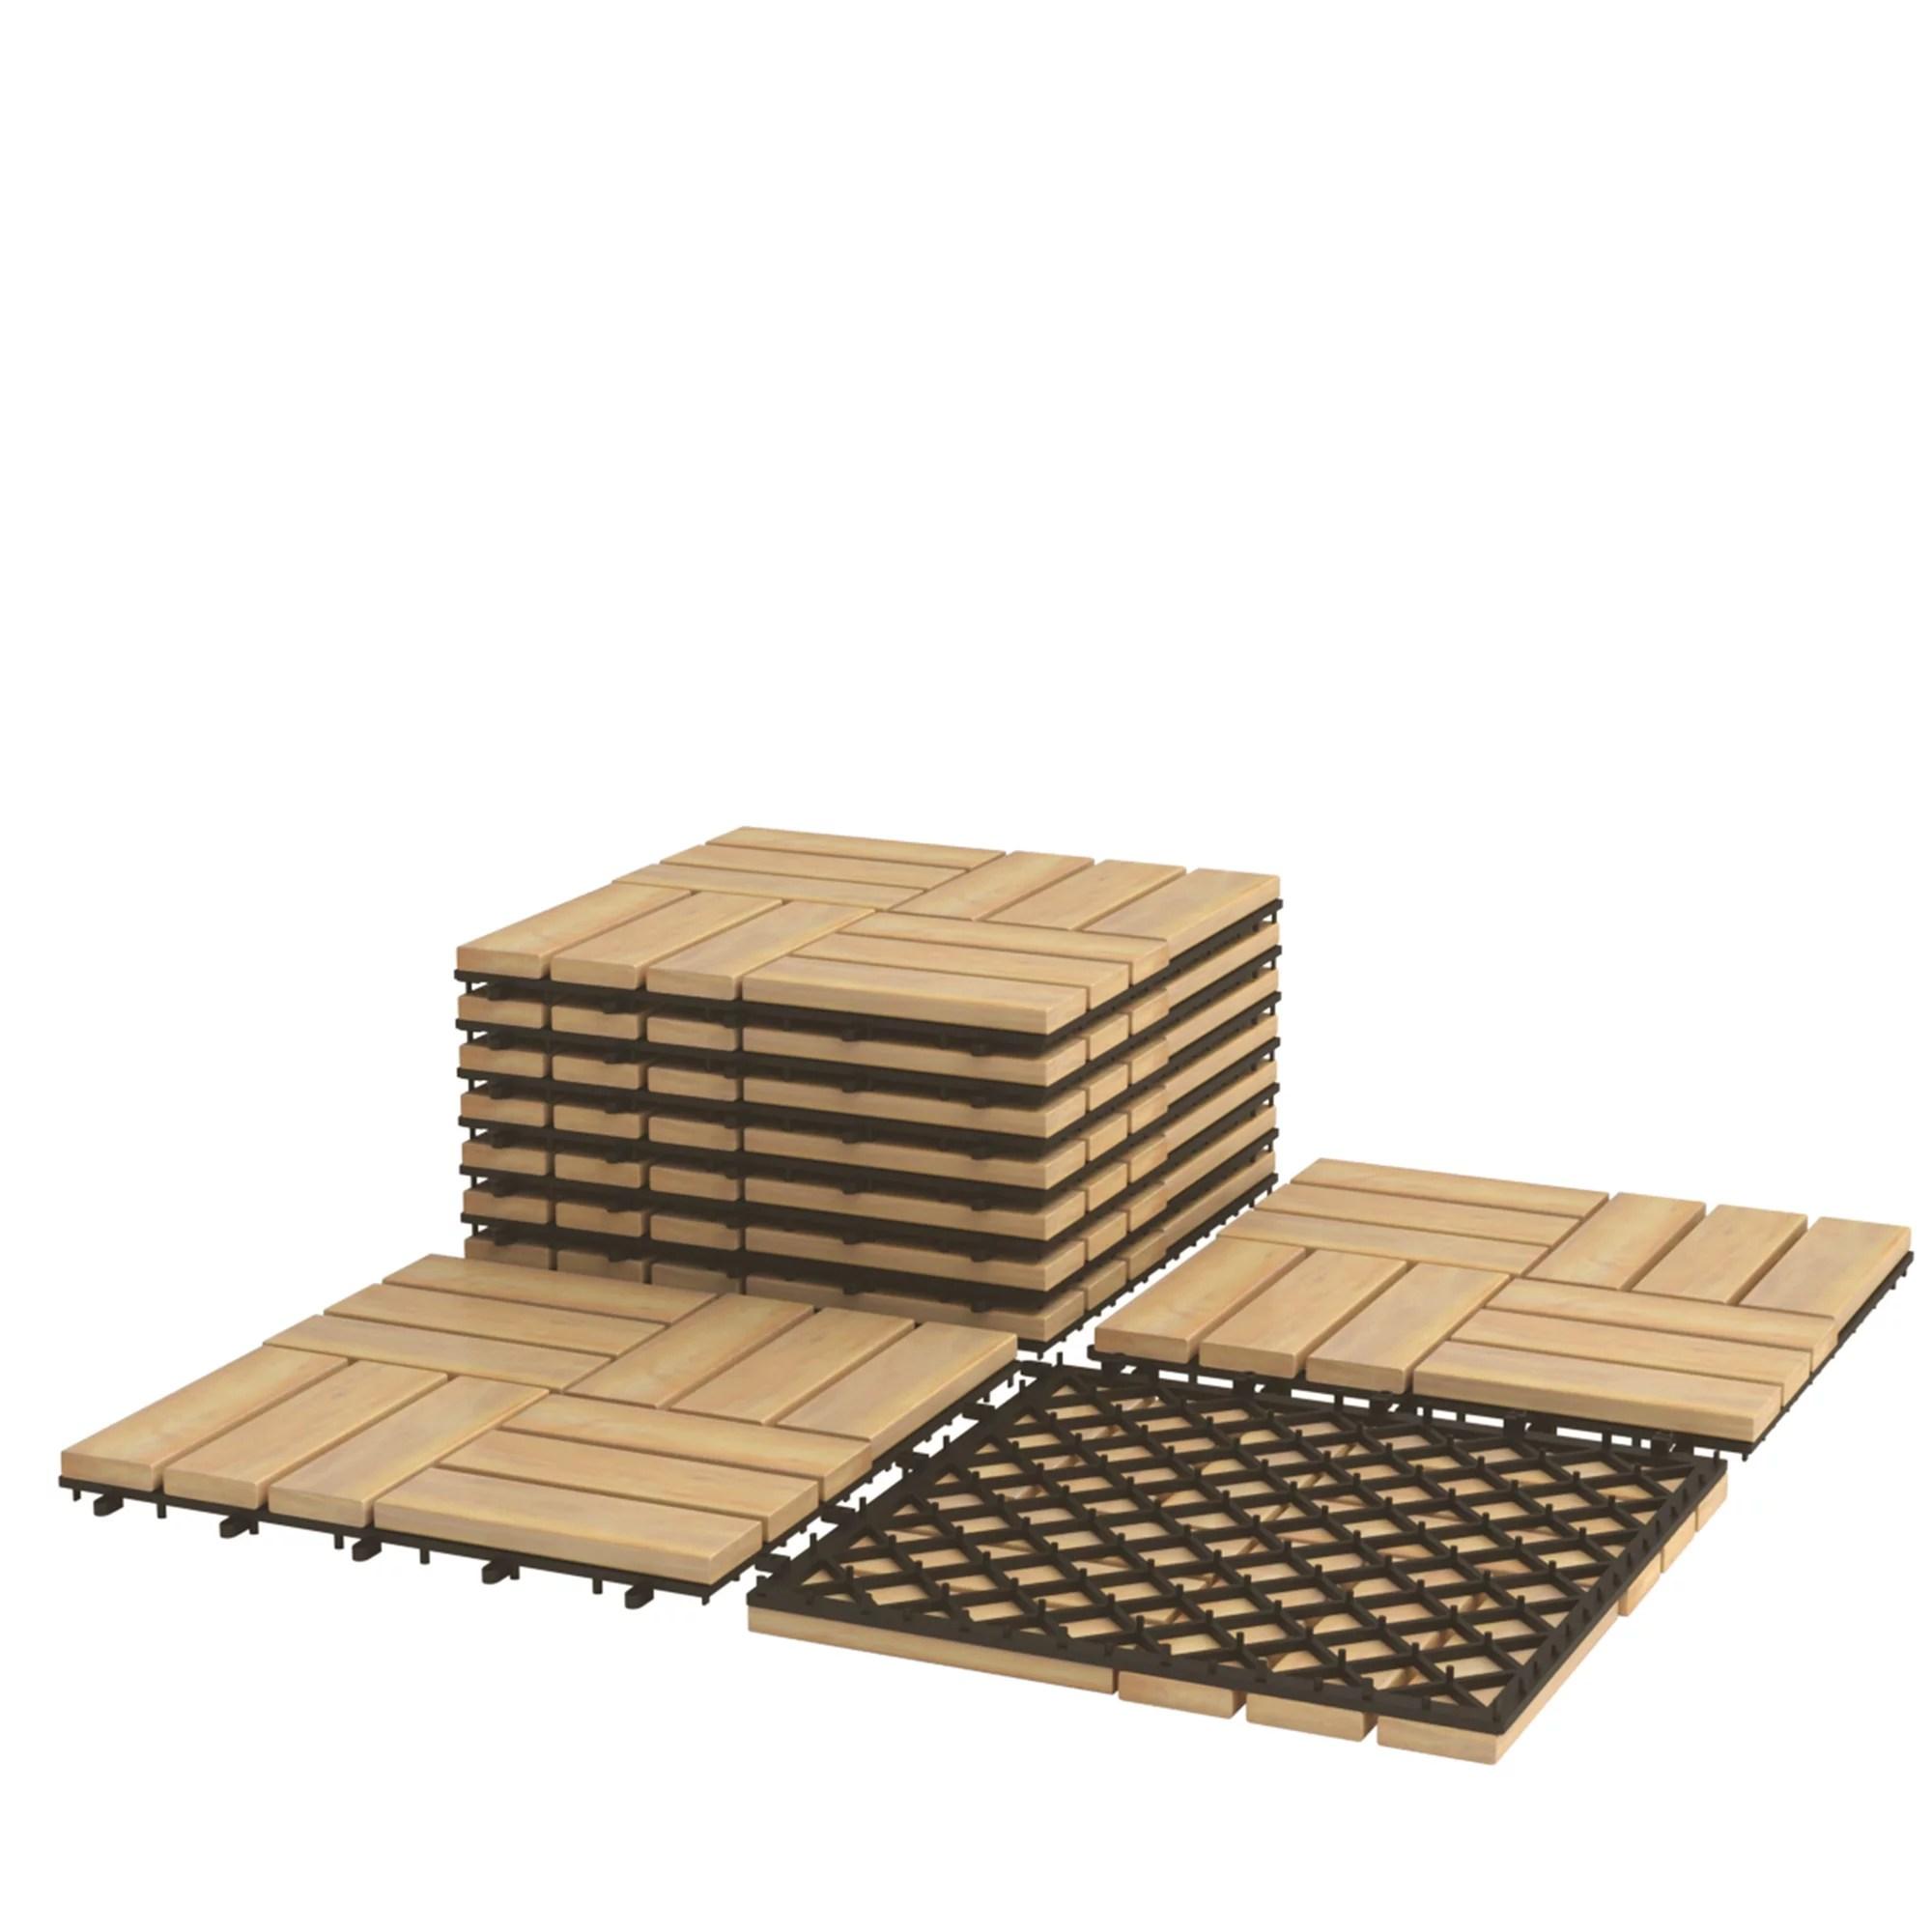 ikea outdoor deck and patio interlocking flooring tiles dark gray